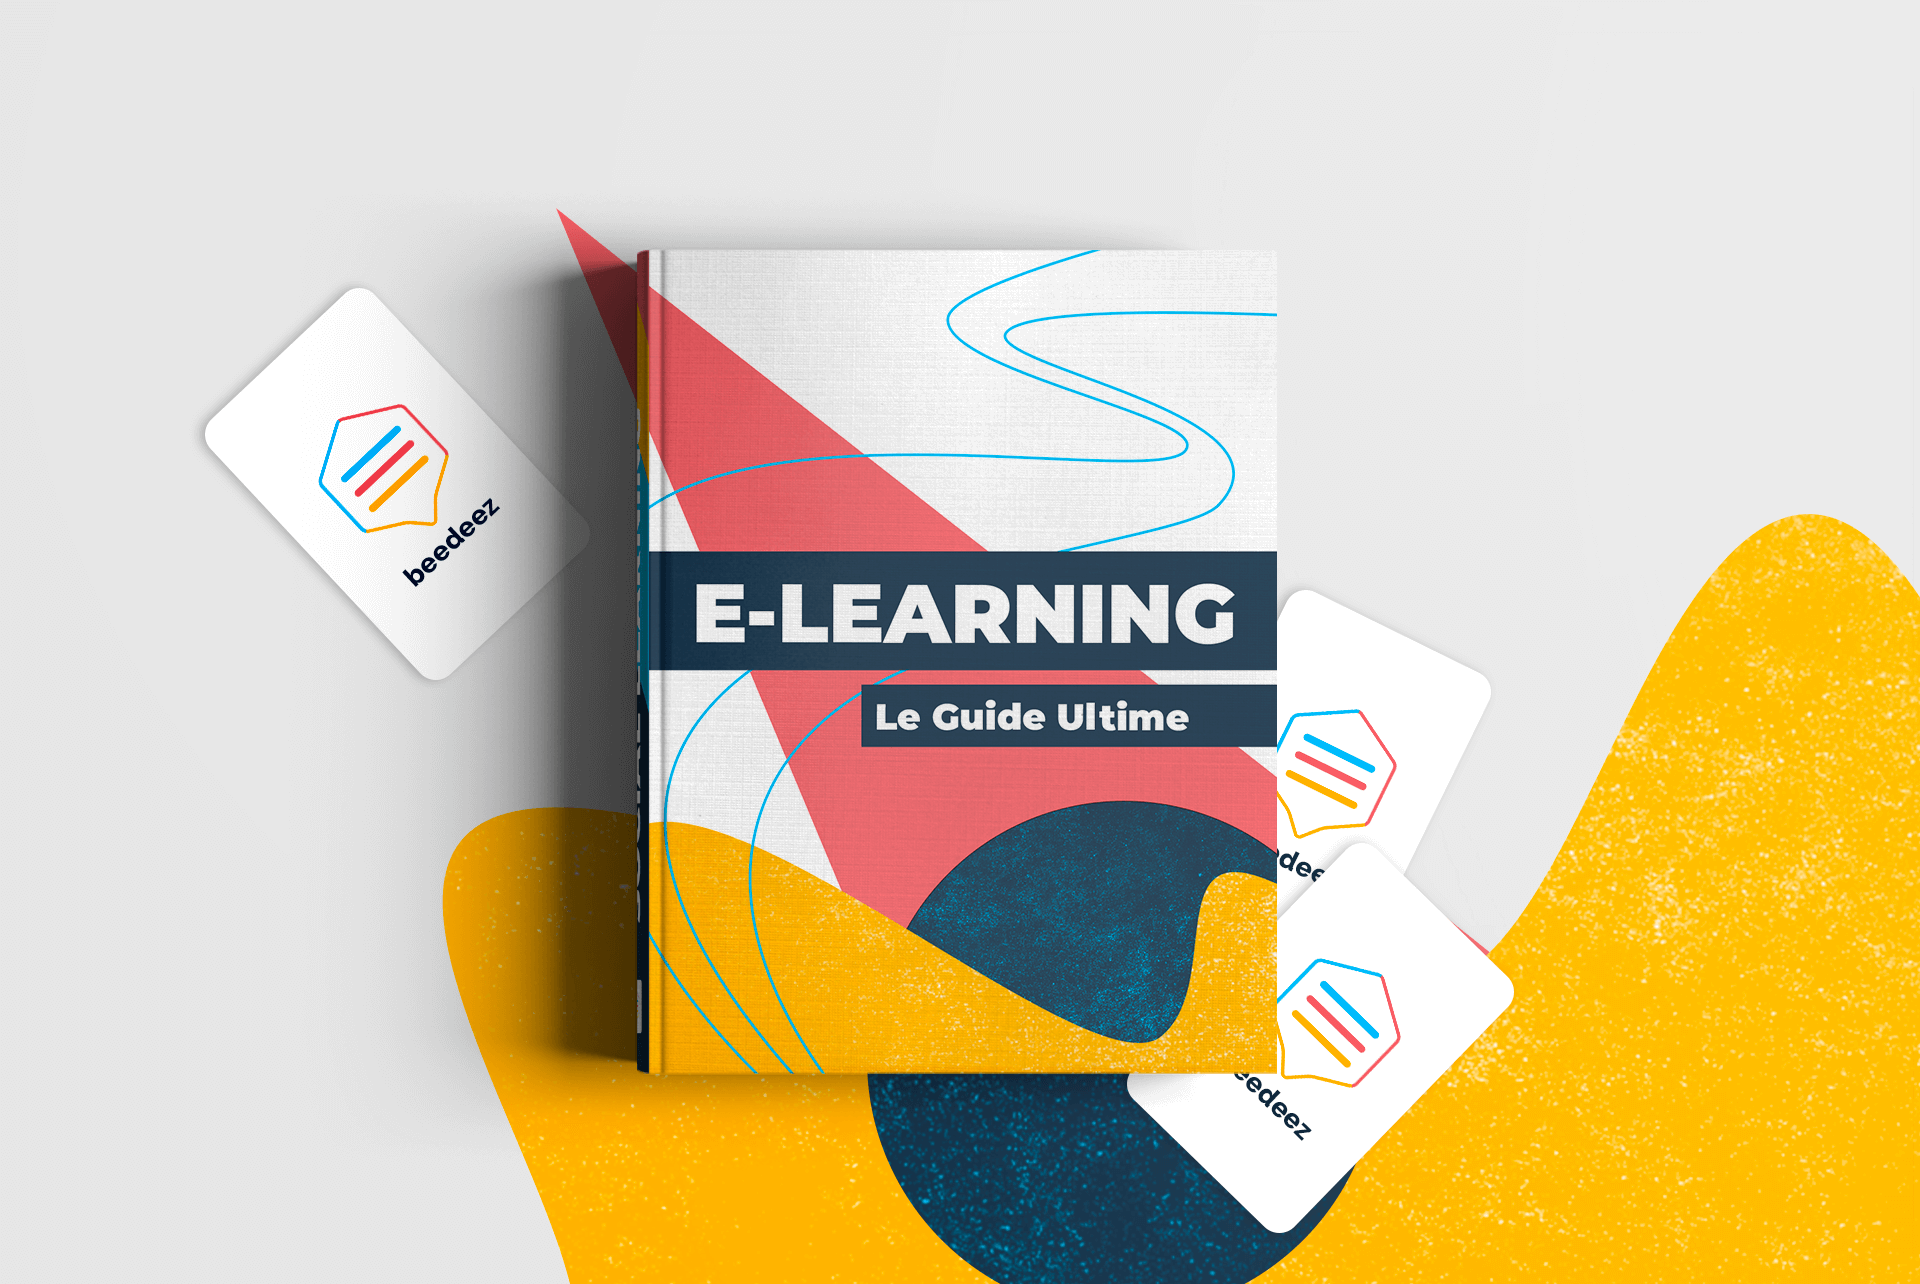 E-LEARNING guide ultime